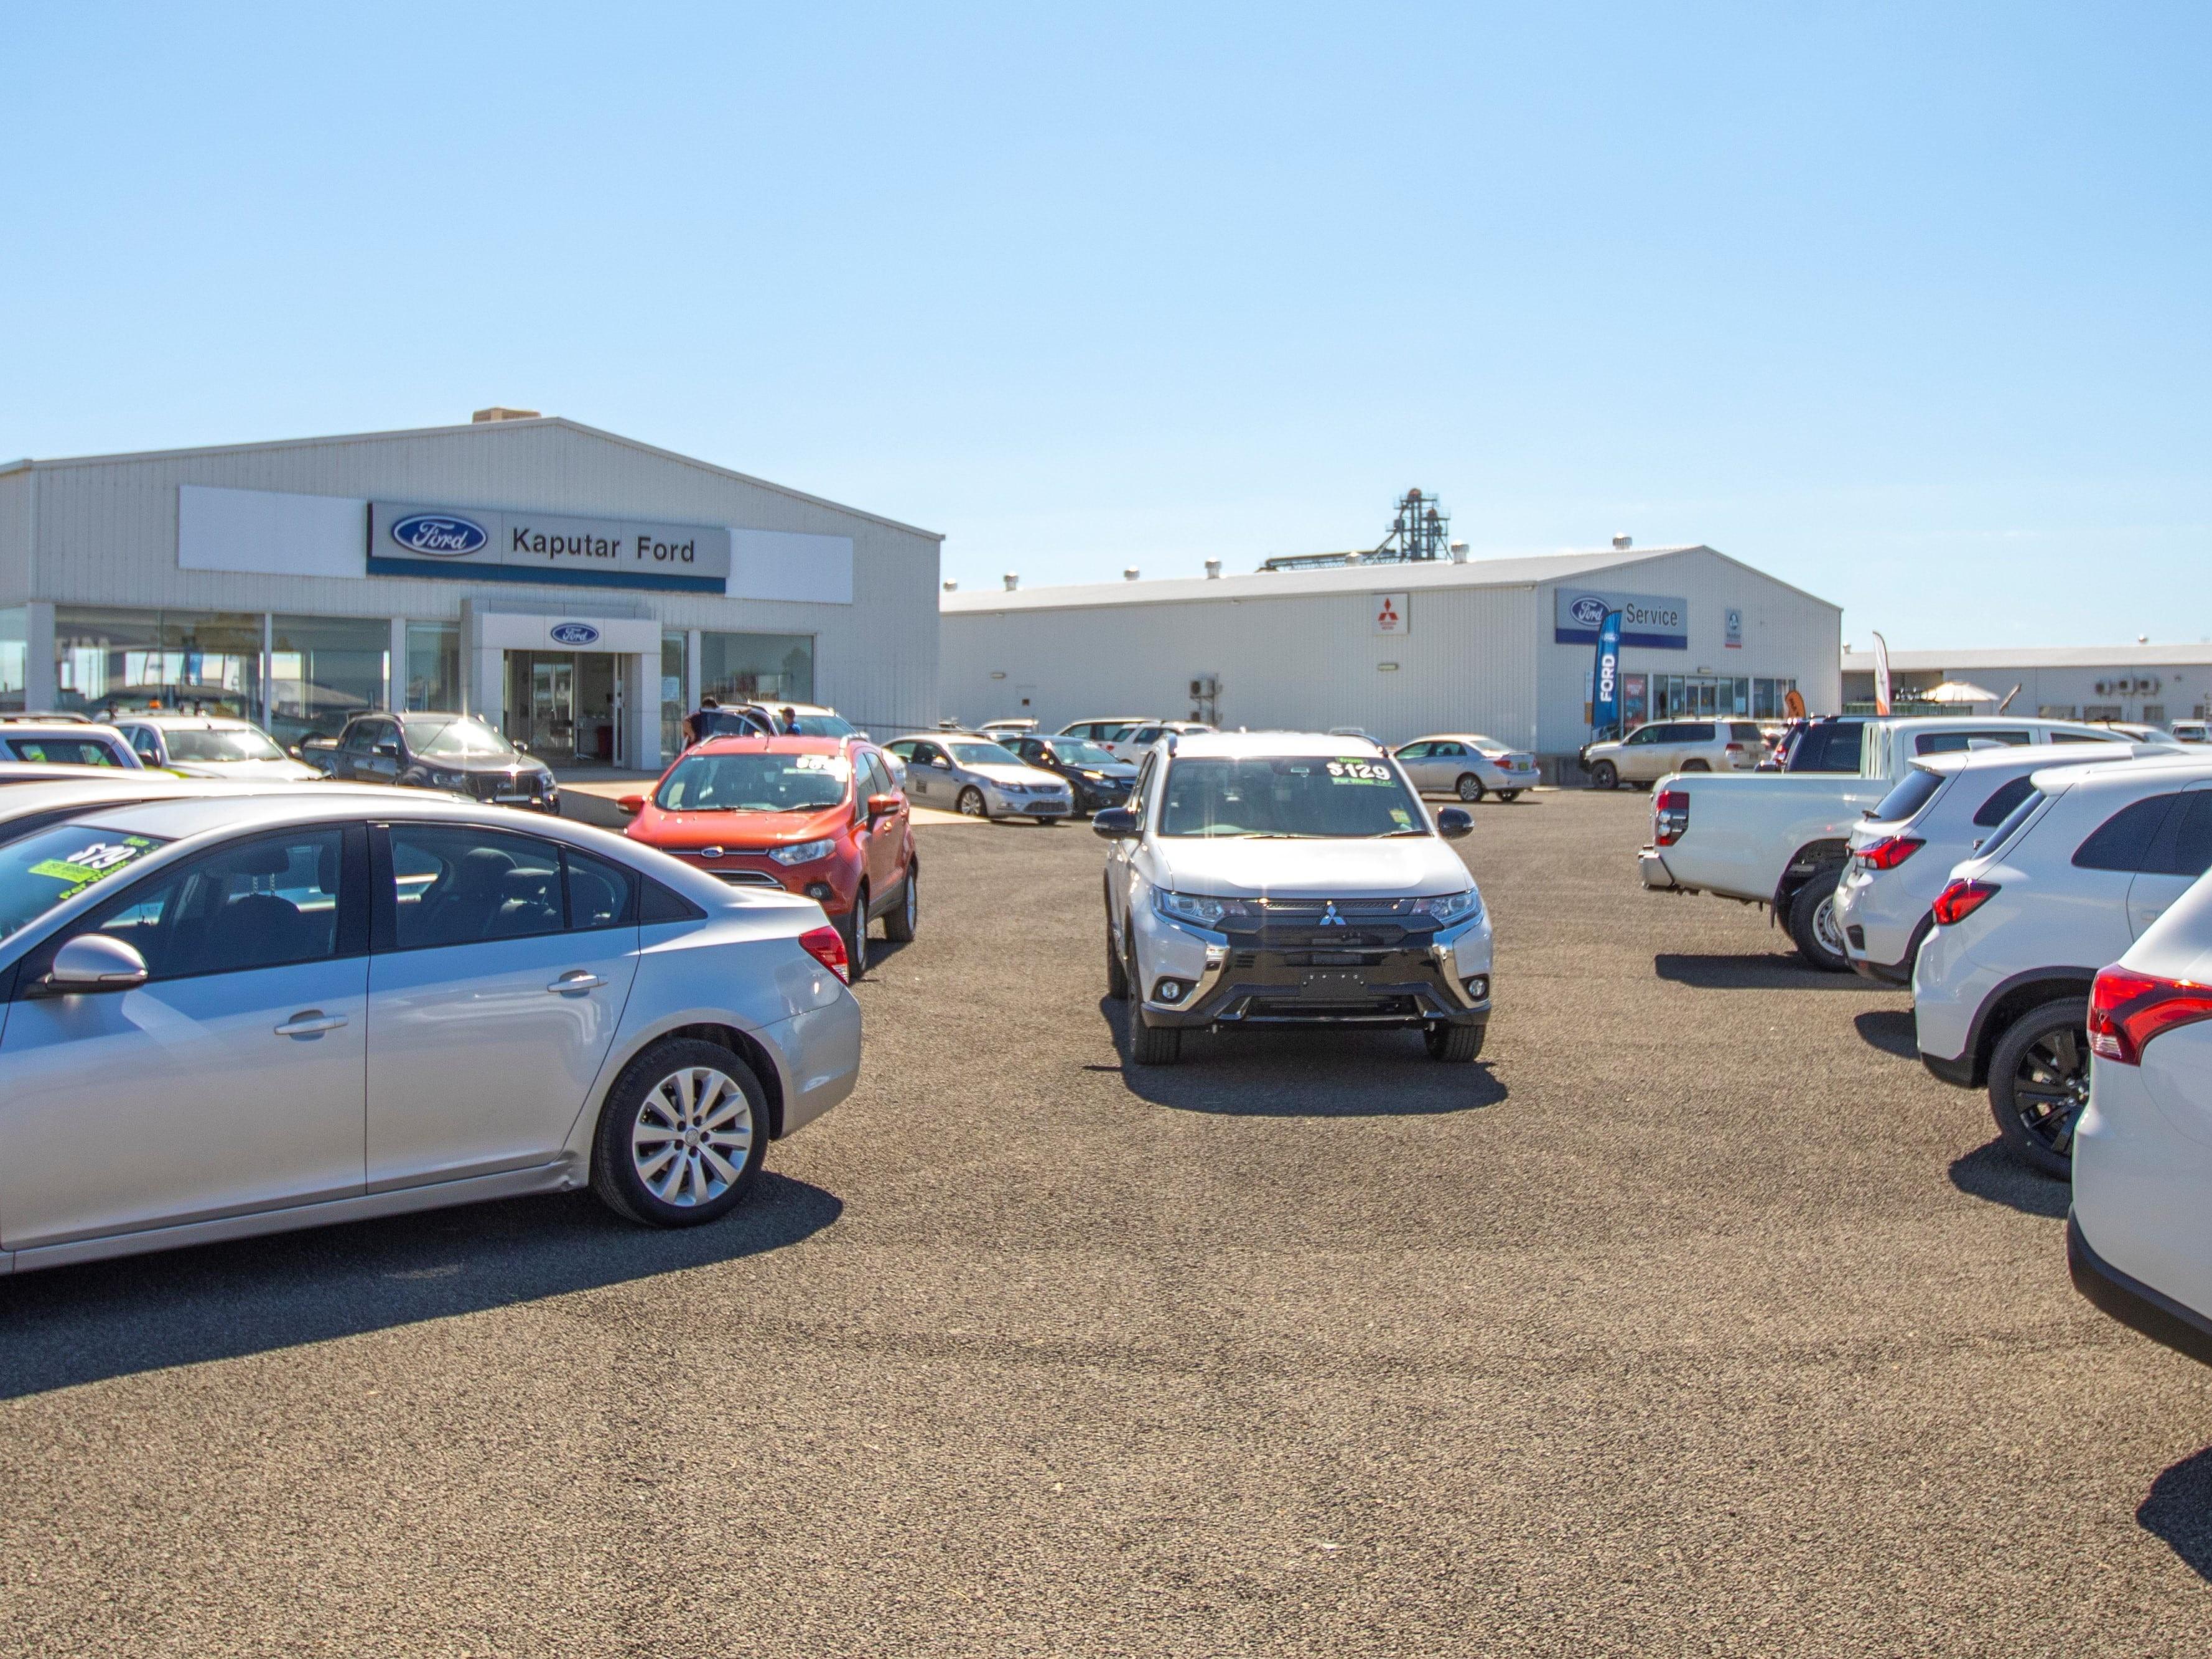 High Exposure Award Winning Car Dealership – New 5 Year Net Lease + Options, 3% Increases